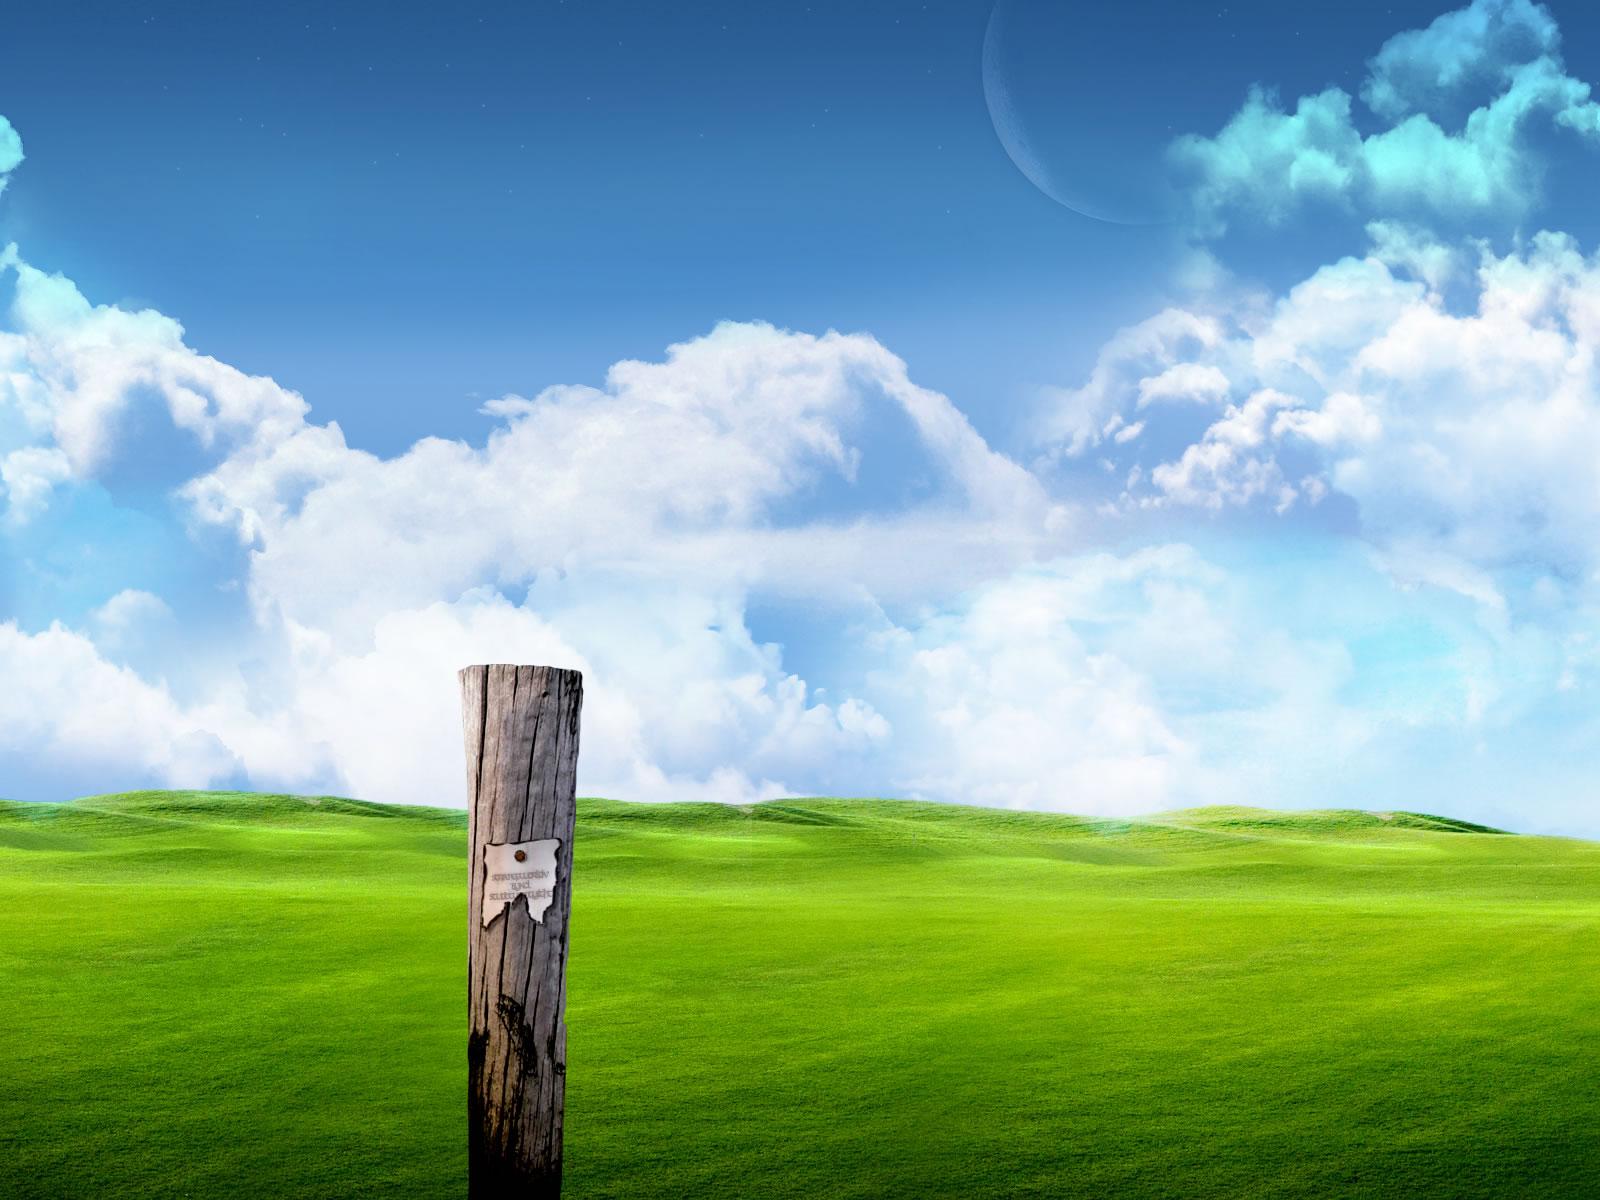 Scenery wallpaper fond d 39 cran paysage virtuel for Design paysage